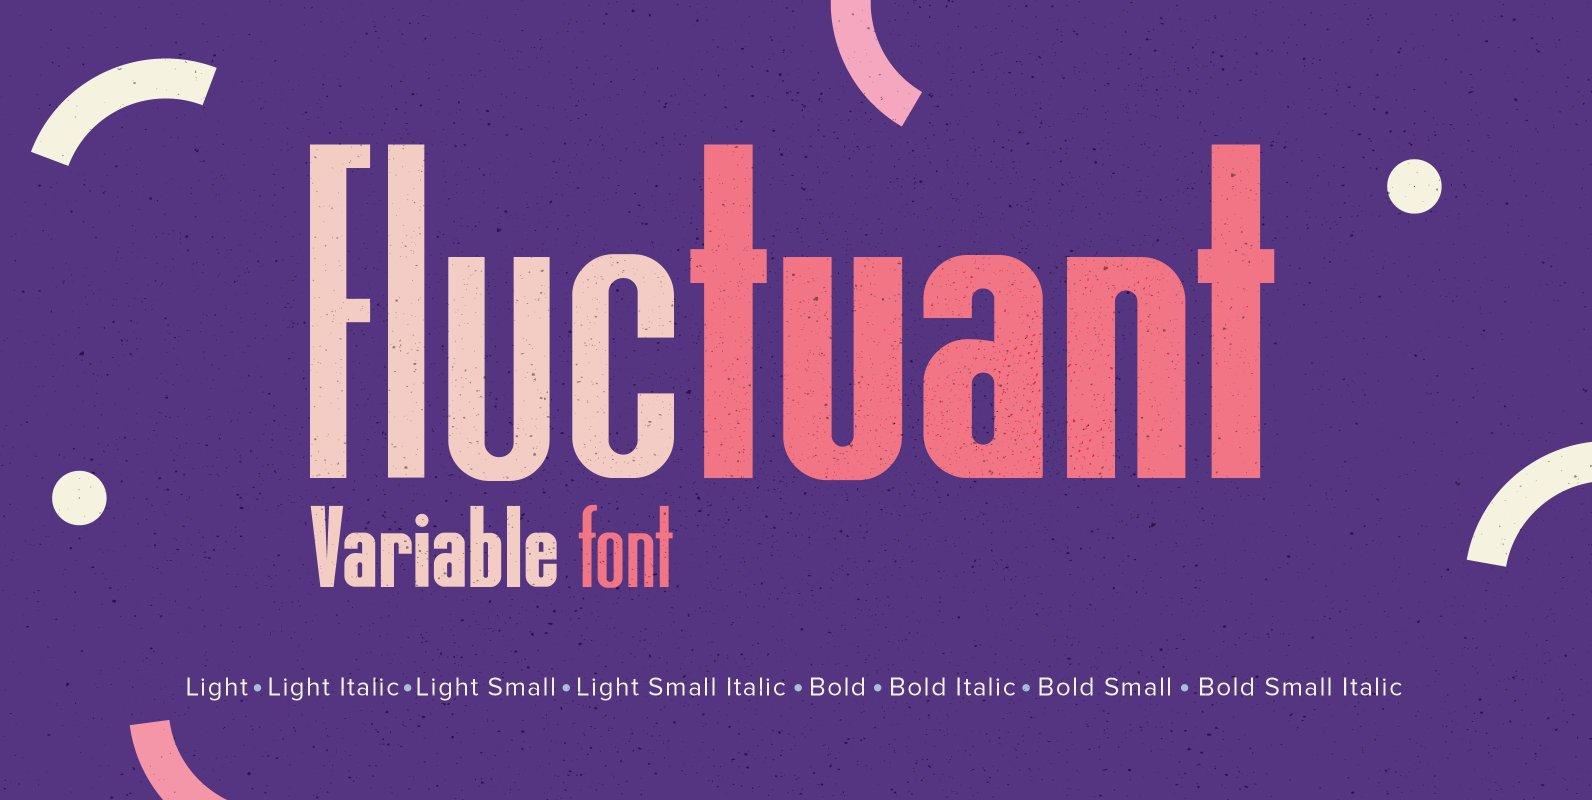 YWFT Fluctuant (Variable Font)